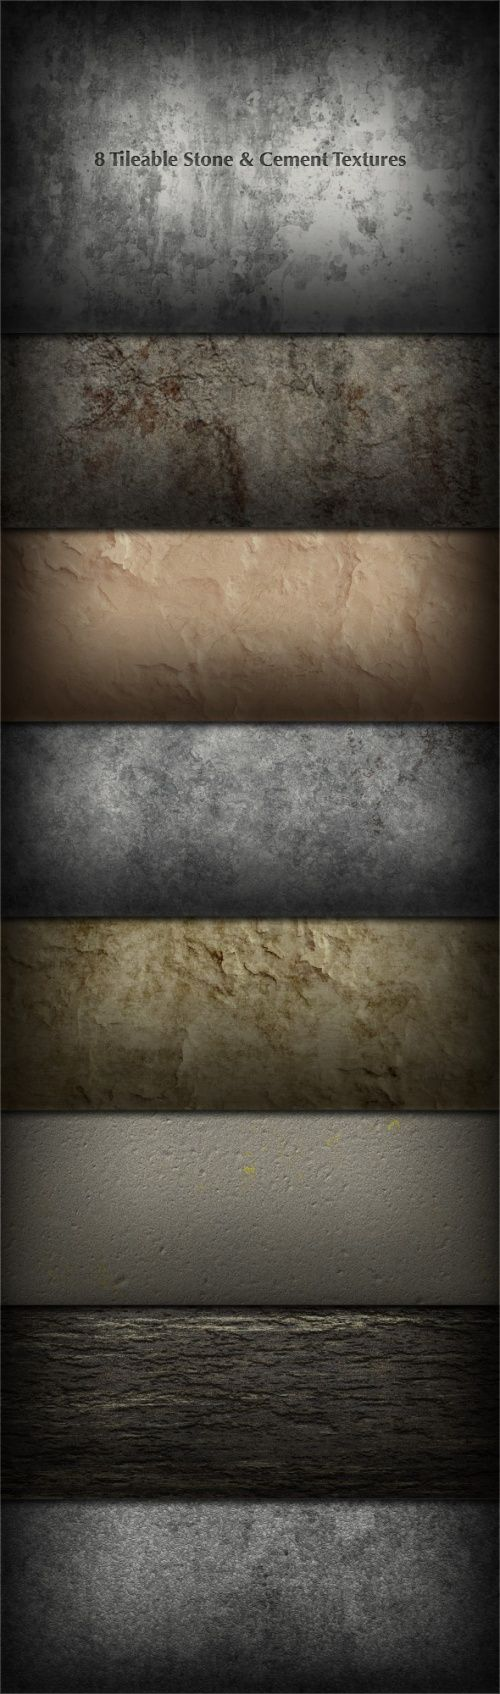 Бесшовные заливки - Бетонные и каменные стены... free download....... http://hqstyles.com/psd/977-besshovnye-zalivki-betonnye-i-kamennye-steny.html